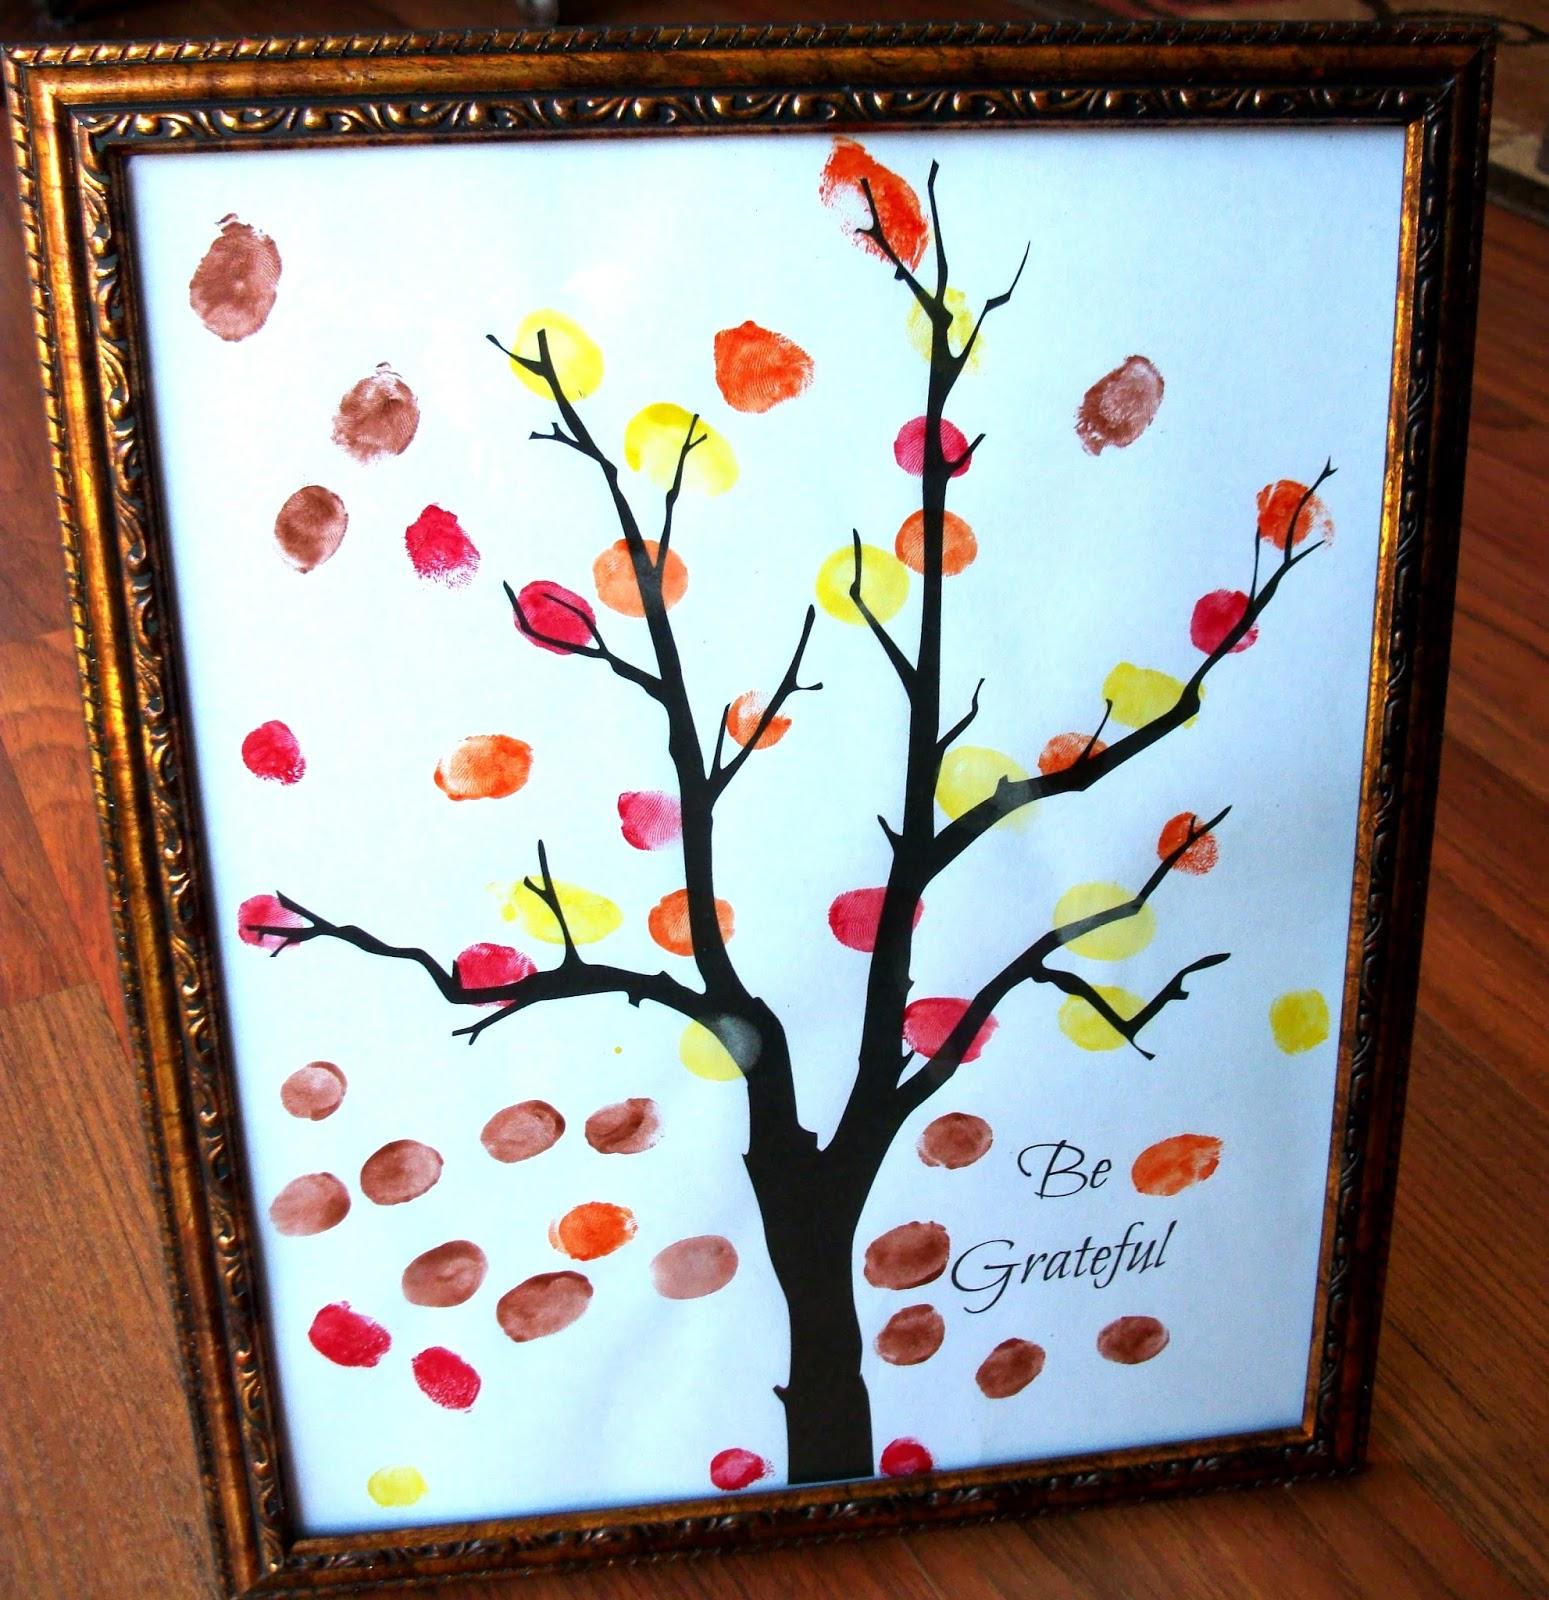 CJO Photo: Printable Thanksgiving Be Grateful Tree